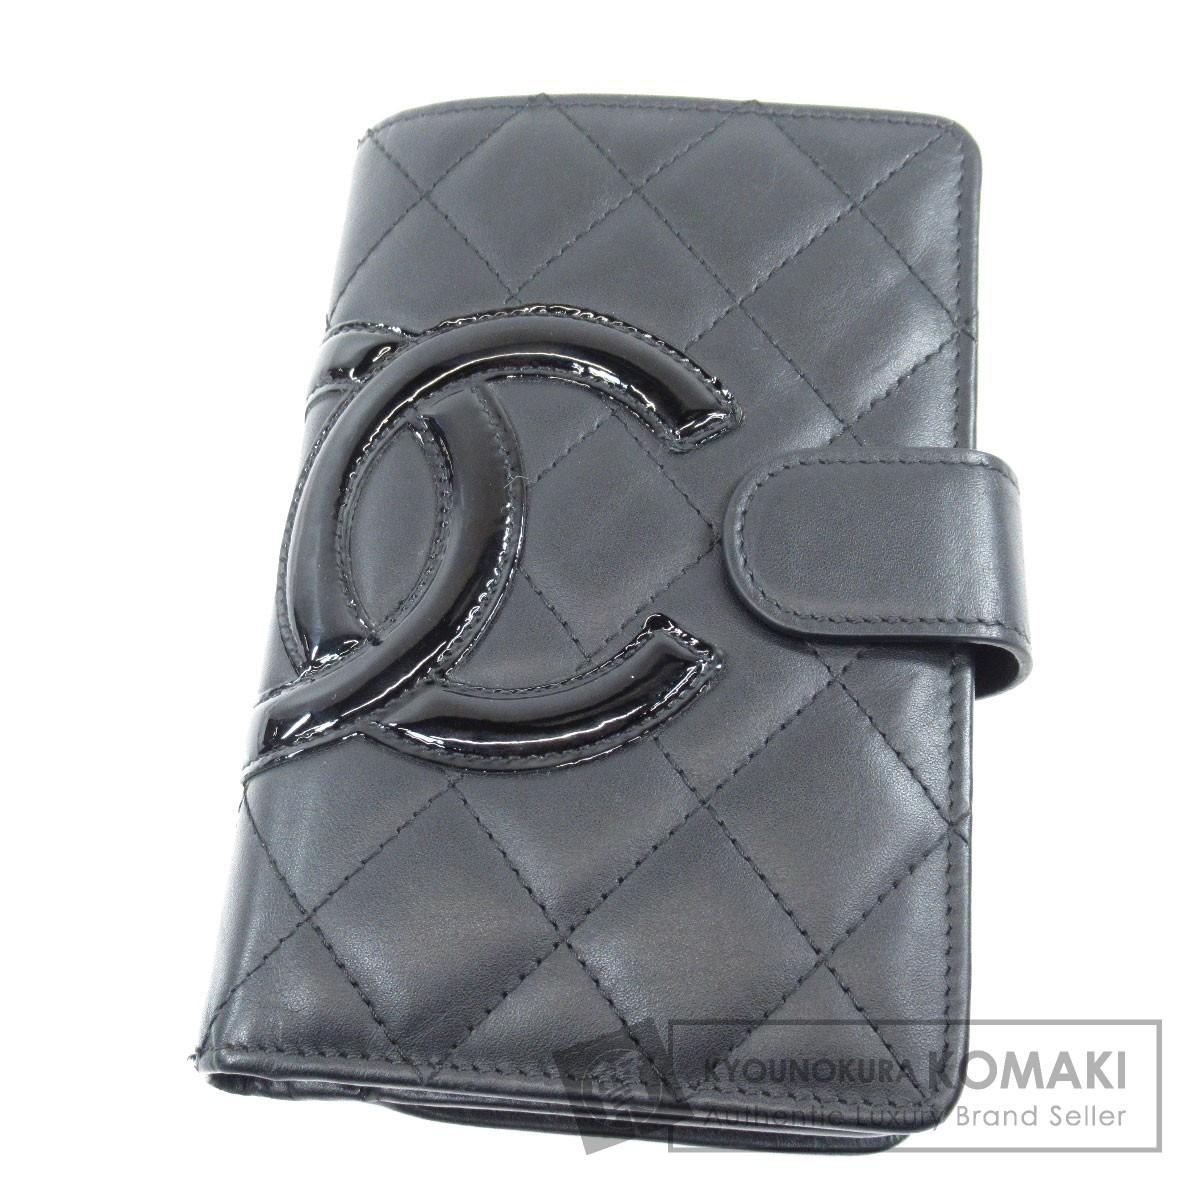 CHANEL カンボンライン 二つ折り財布(小銭入れあり) レザー レディース 【中古】【シャネル】